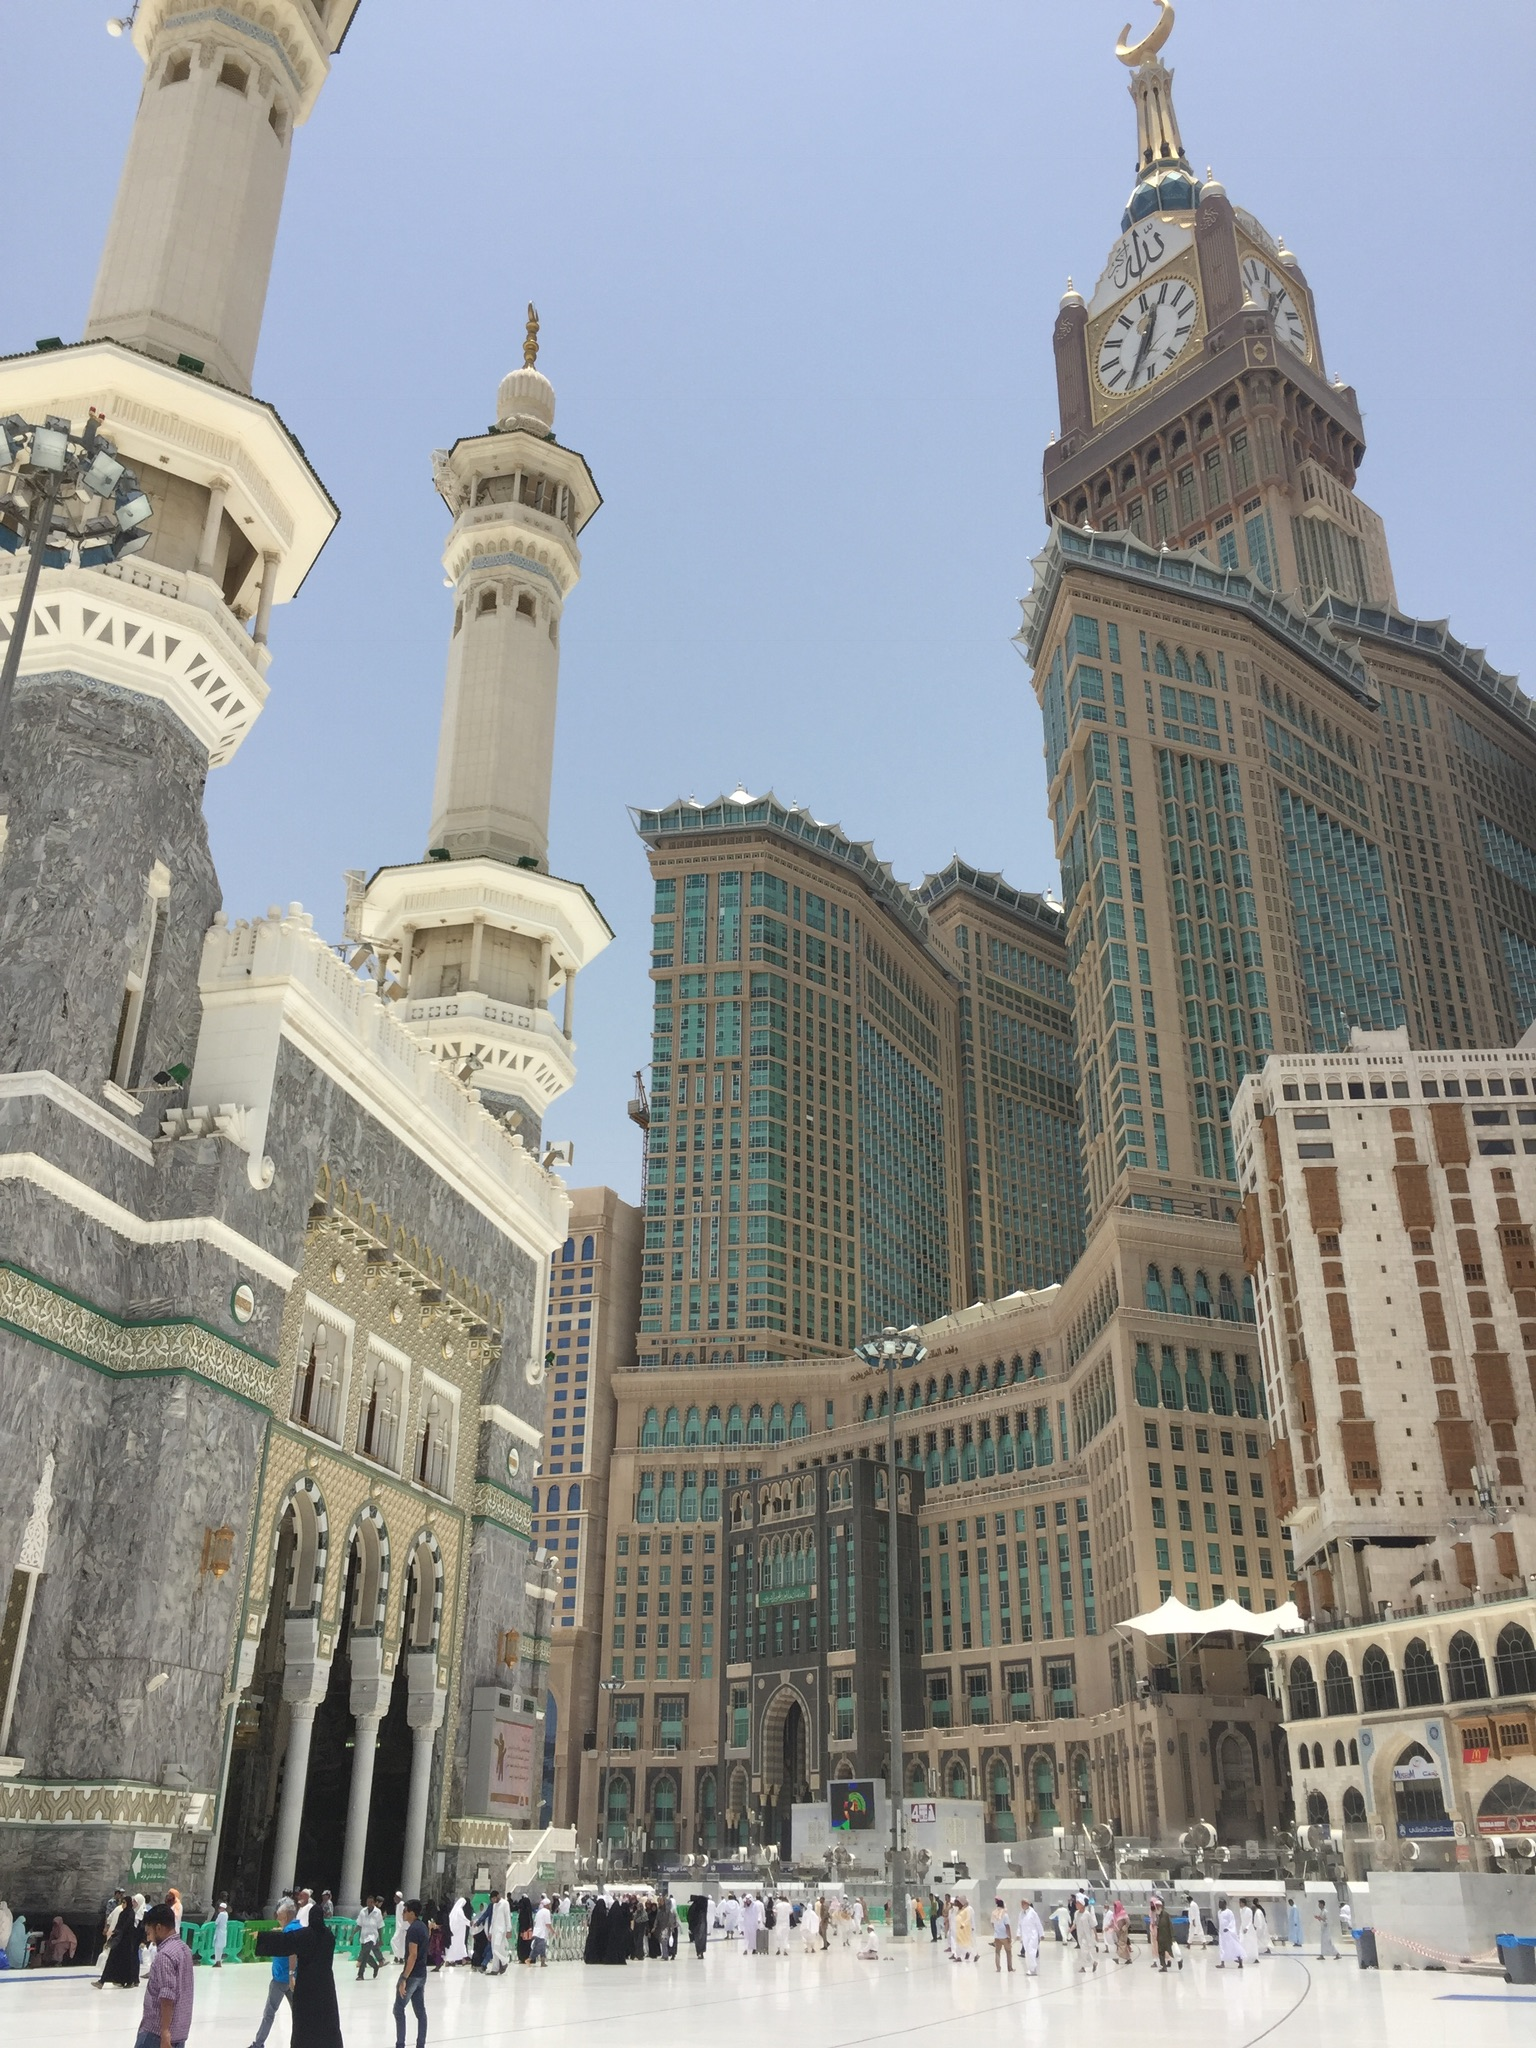 Stay at Abraj Al Bait (Clock Tower)